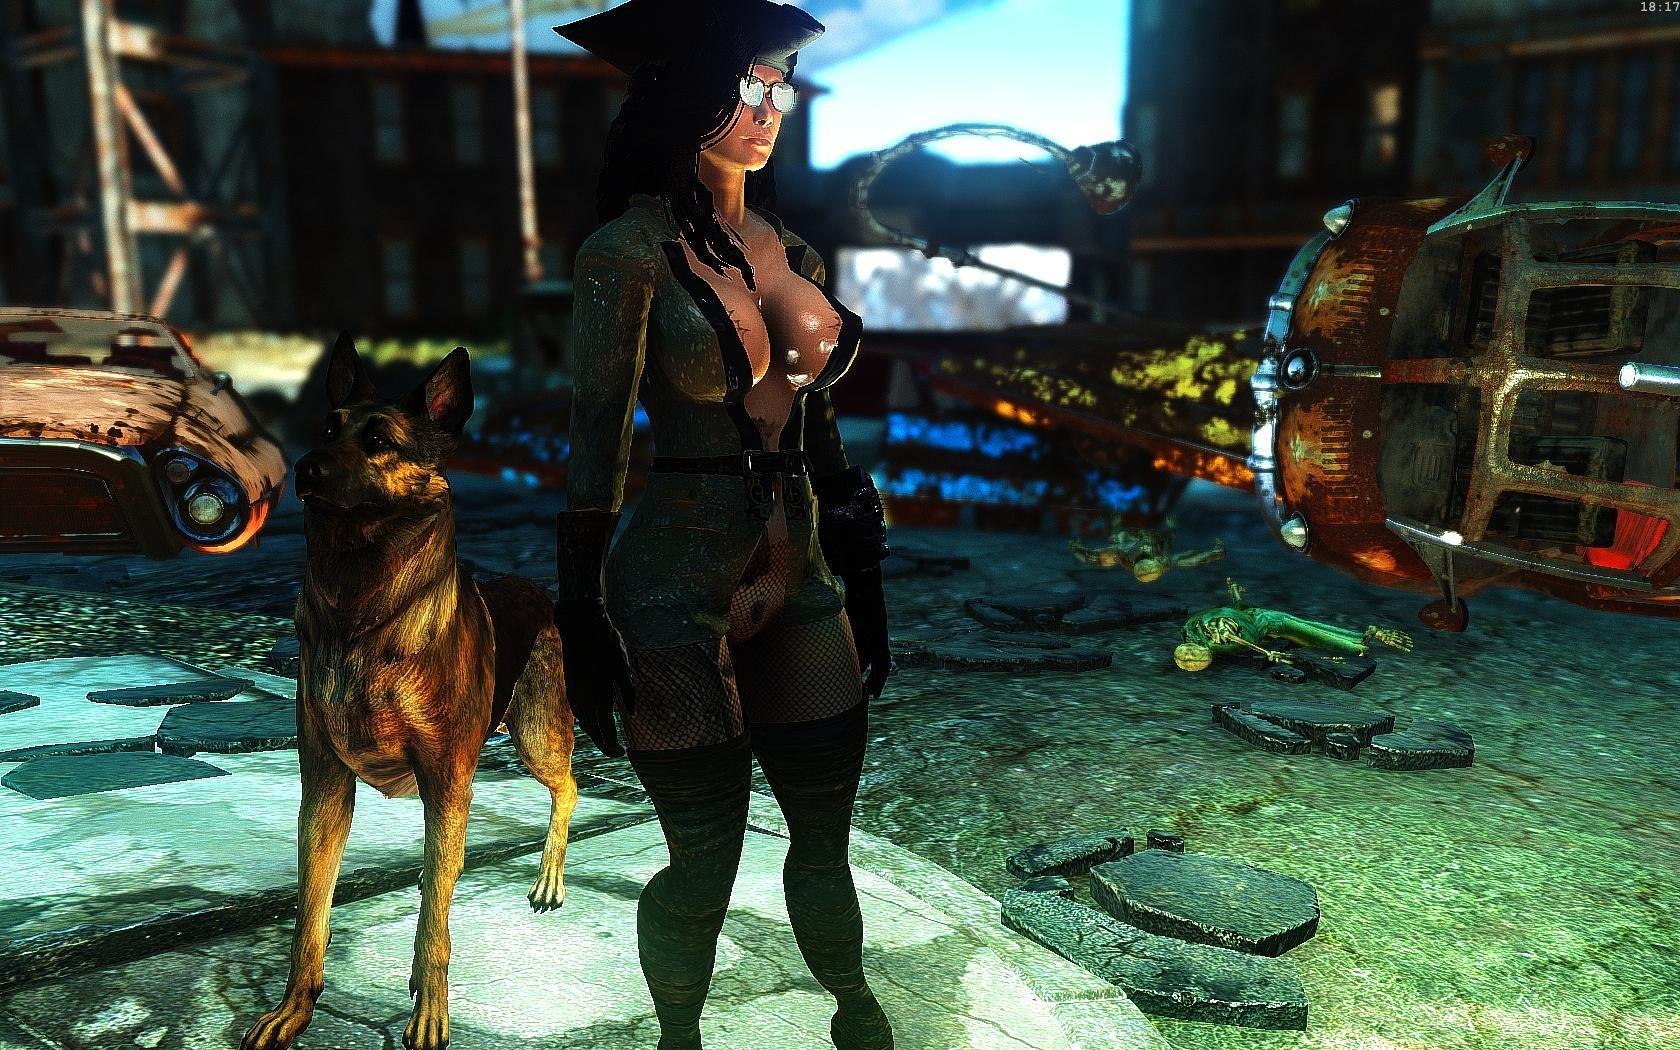 Fallout4 2019-02-07 18-17-44-43